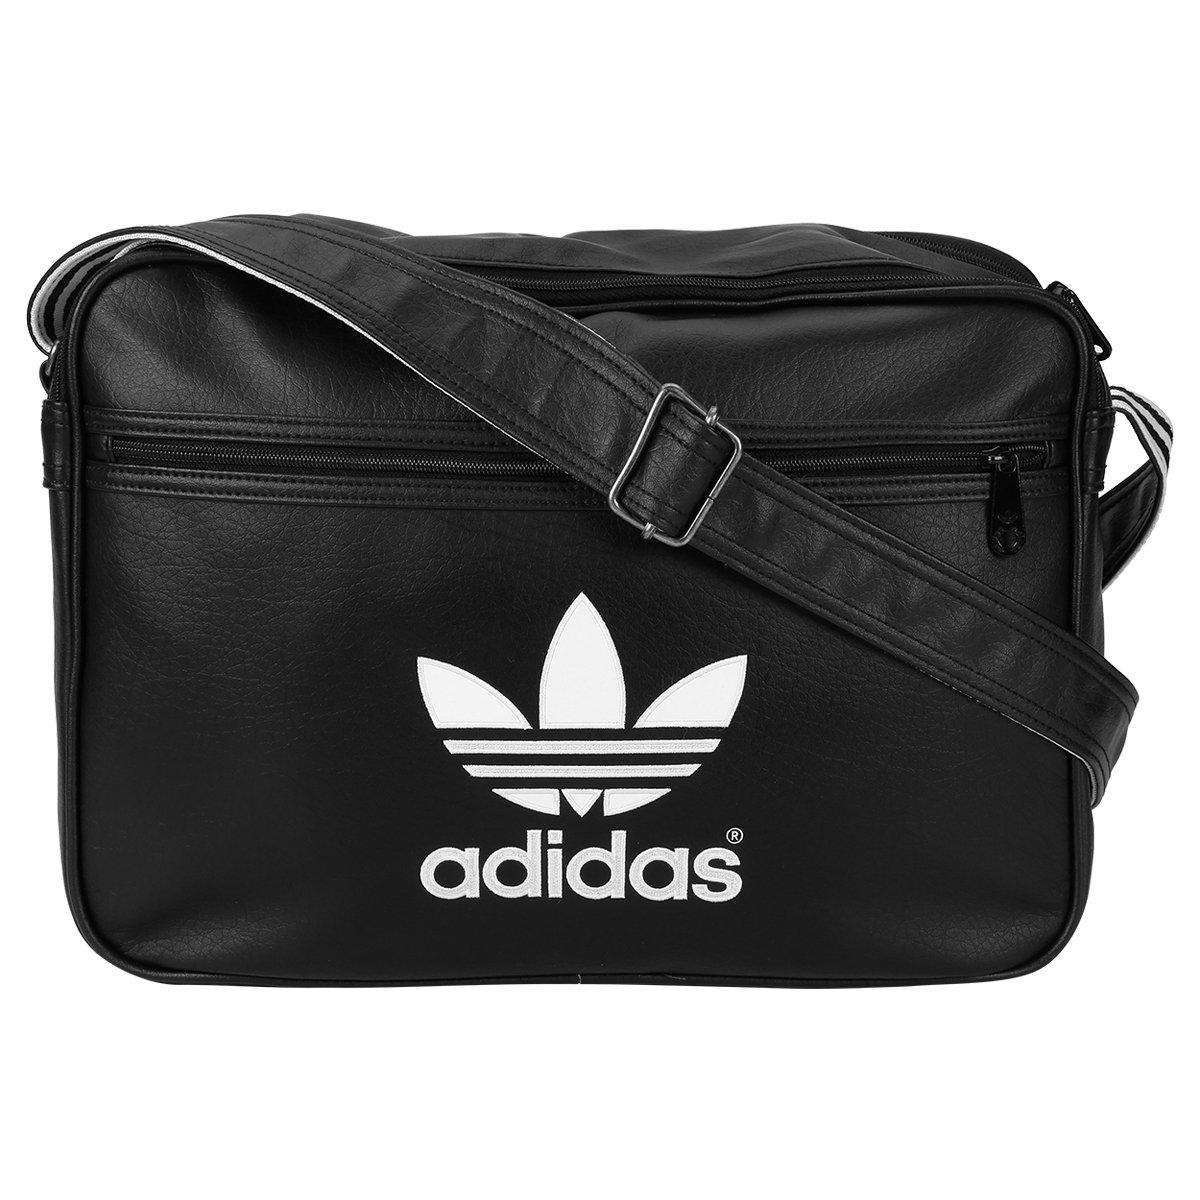 c03e76319 Bolsa Adidas Originals Airliner Adicolor | Netshoes